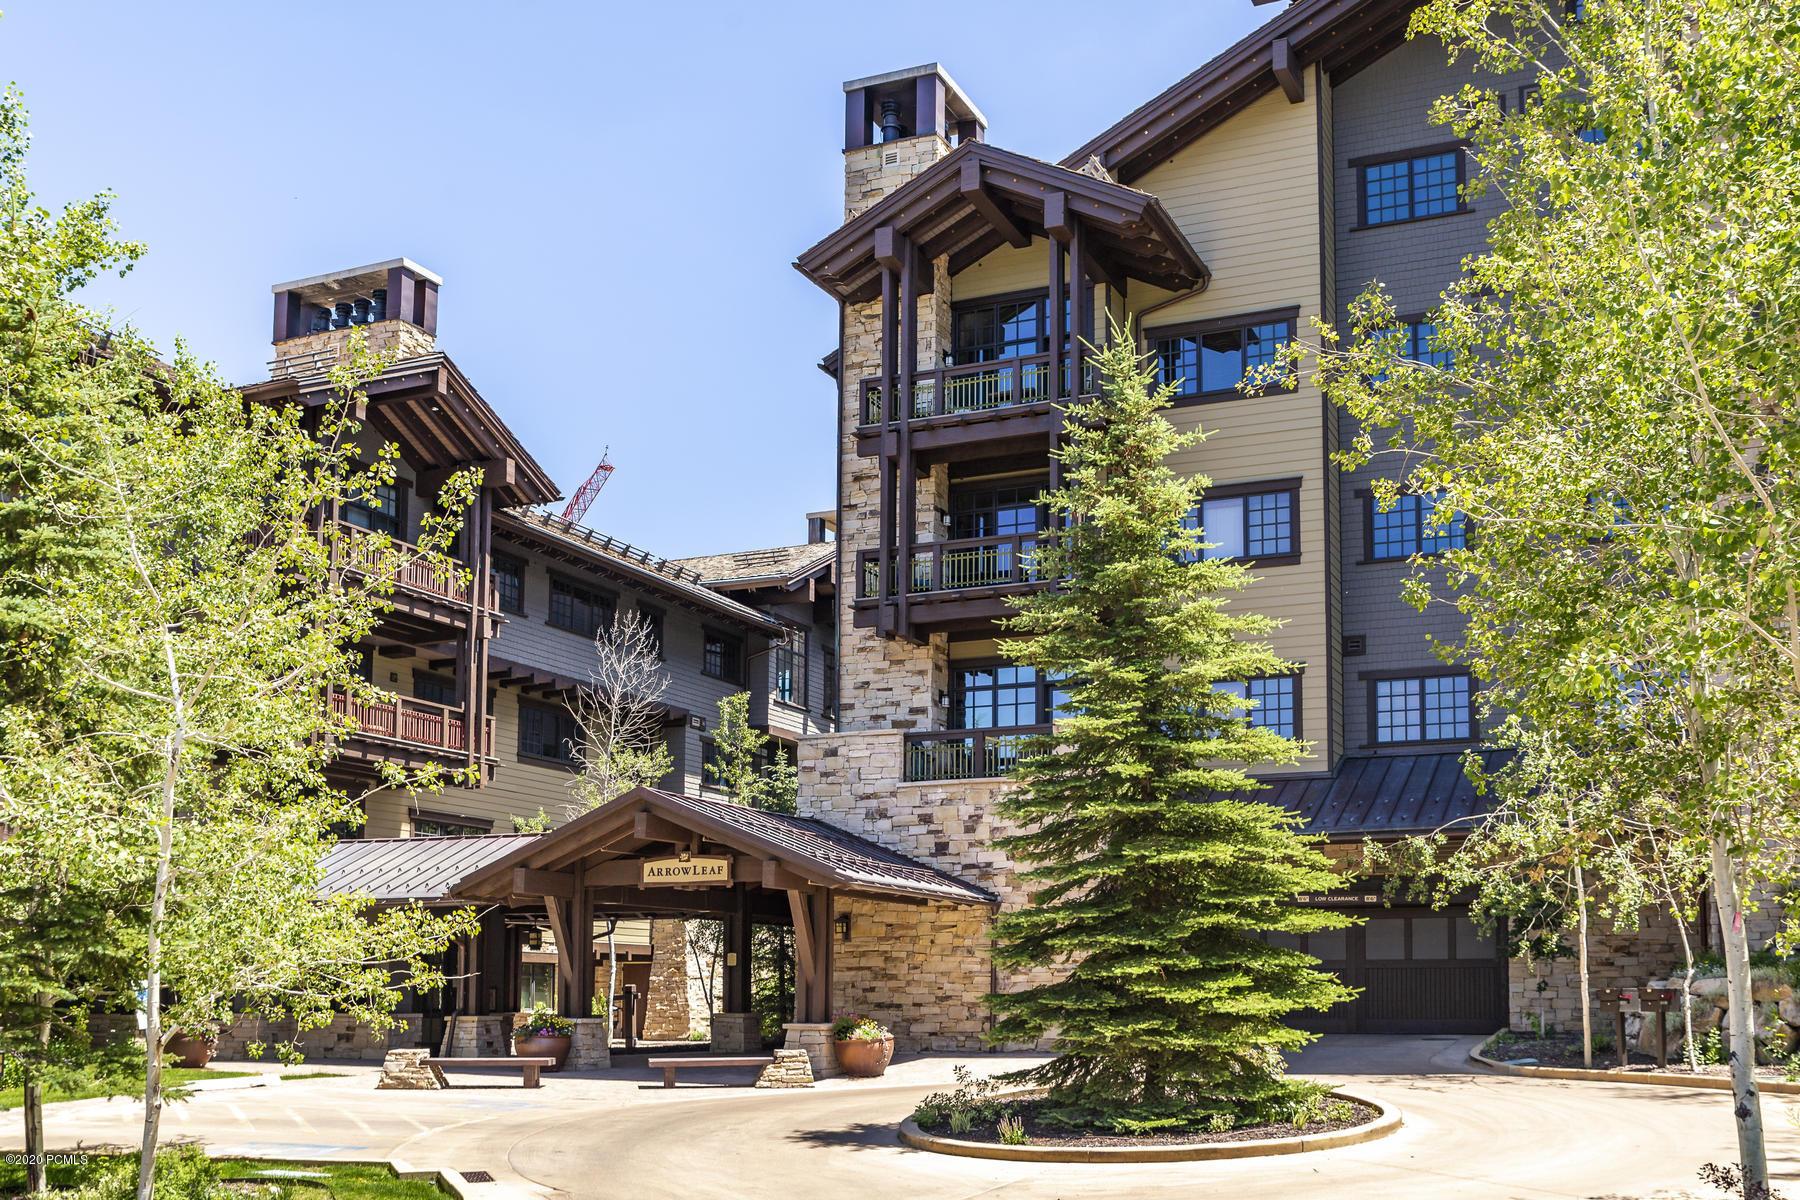 8880 Empire Club Drive, Park City, Utah 84060, 2 Bedrooms Bedrooms, ,3 BathroomsBathrooms,Condominium,For Sale,Empire Club,12002497